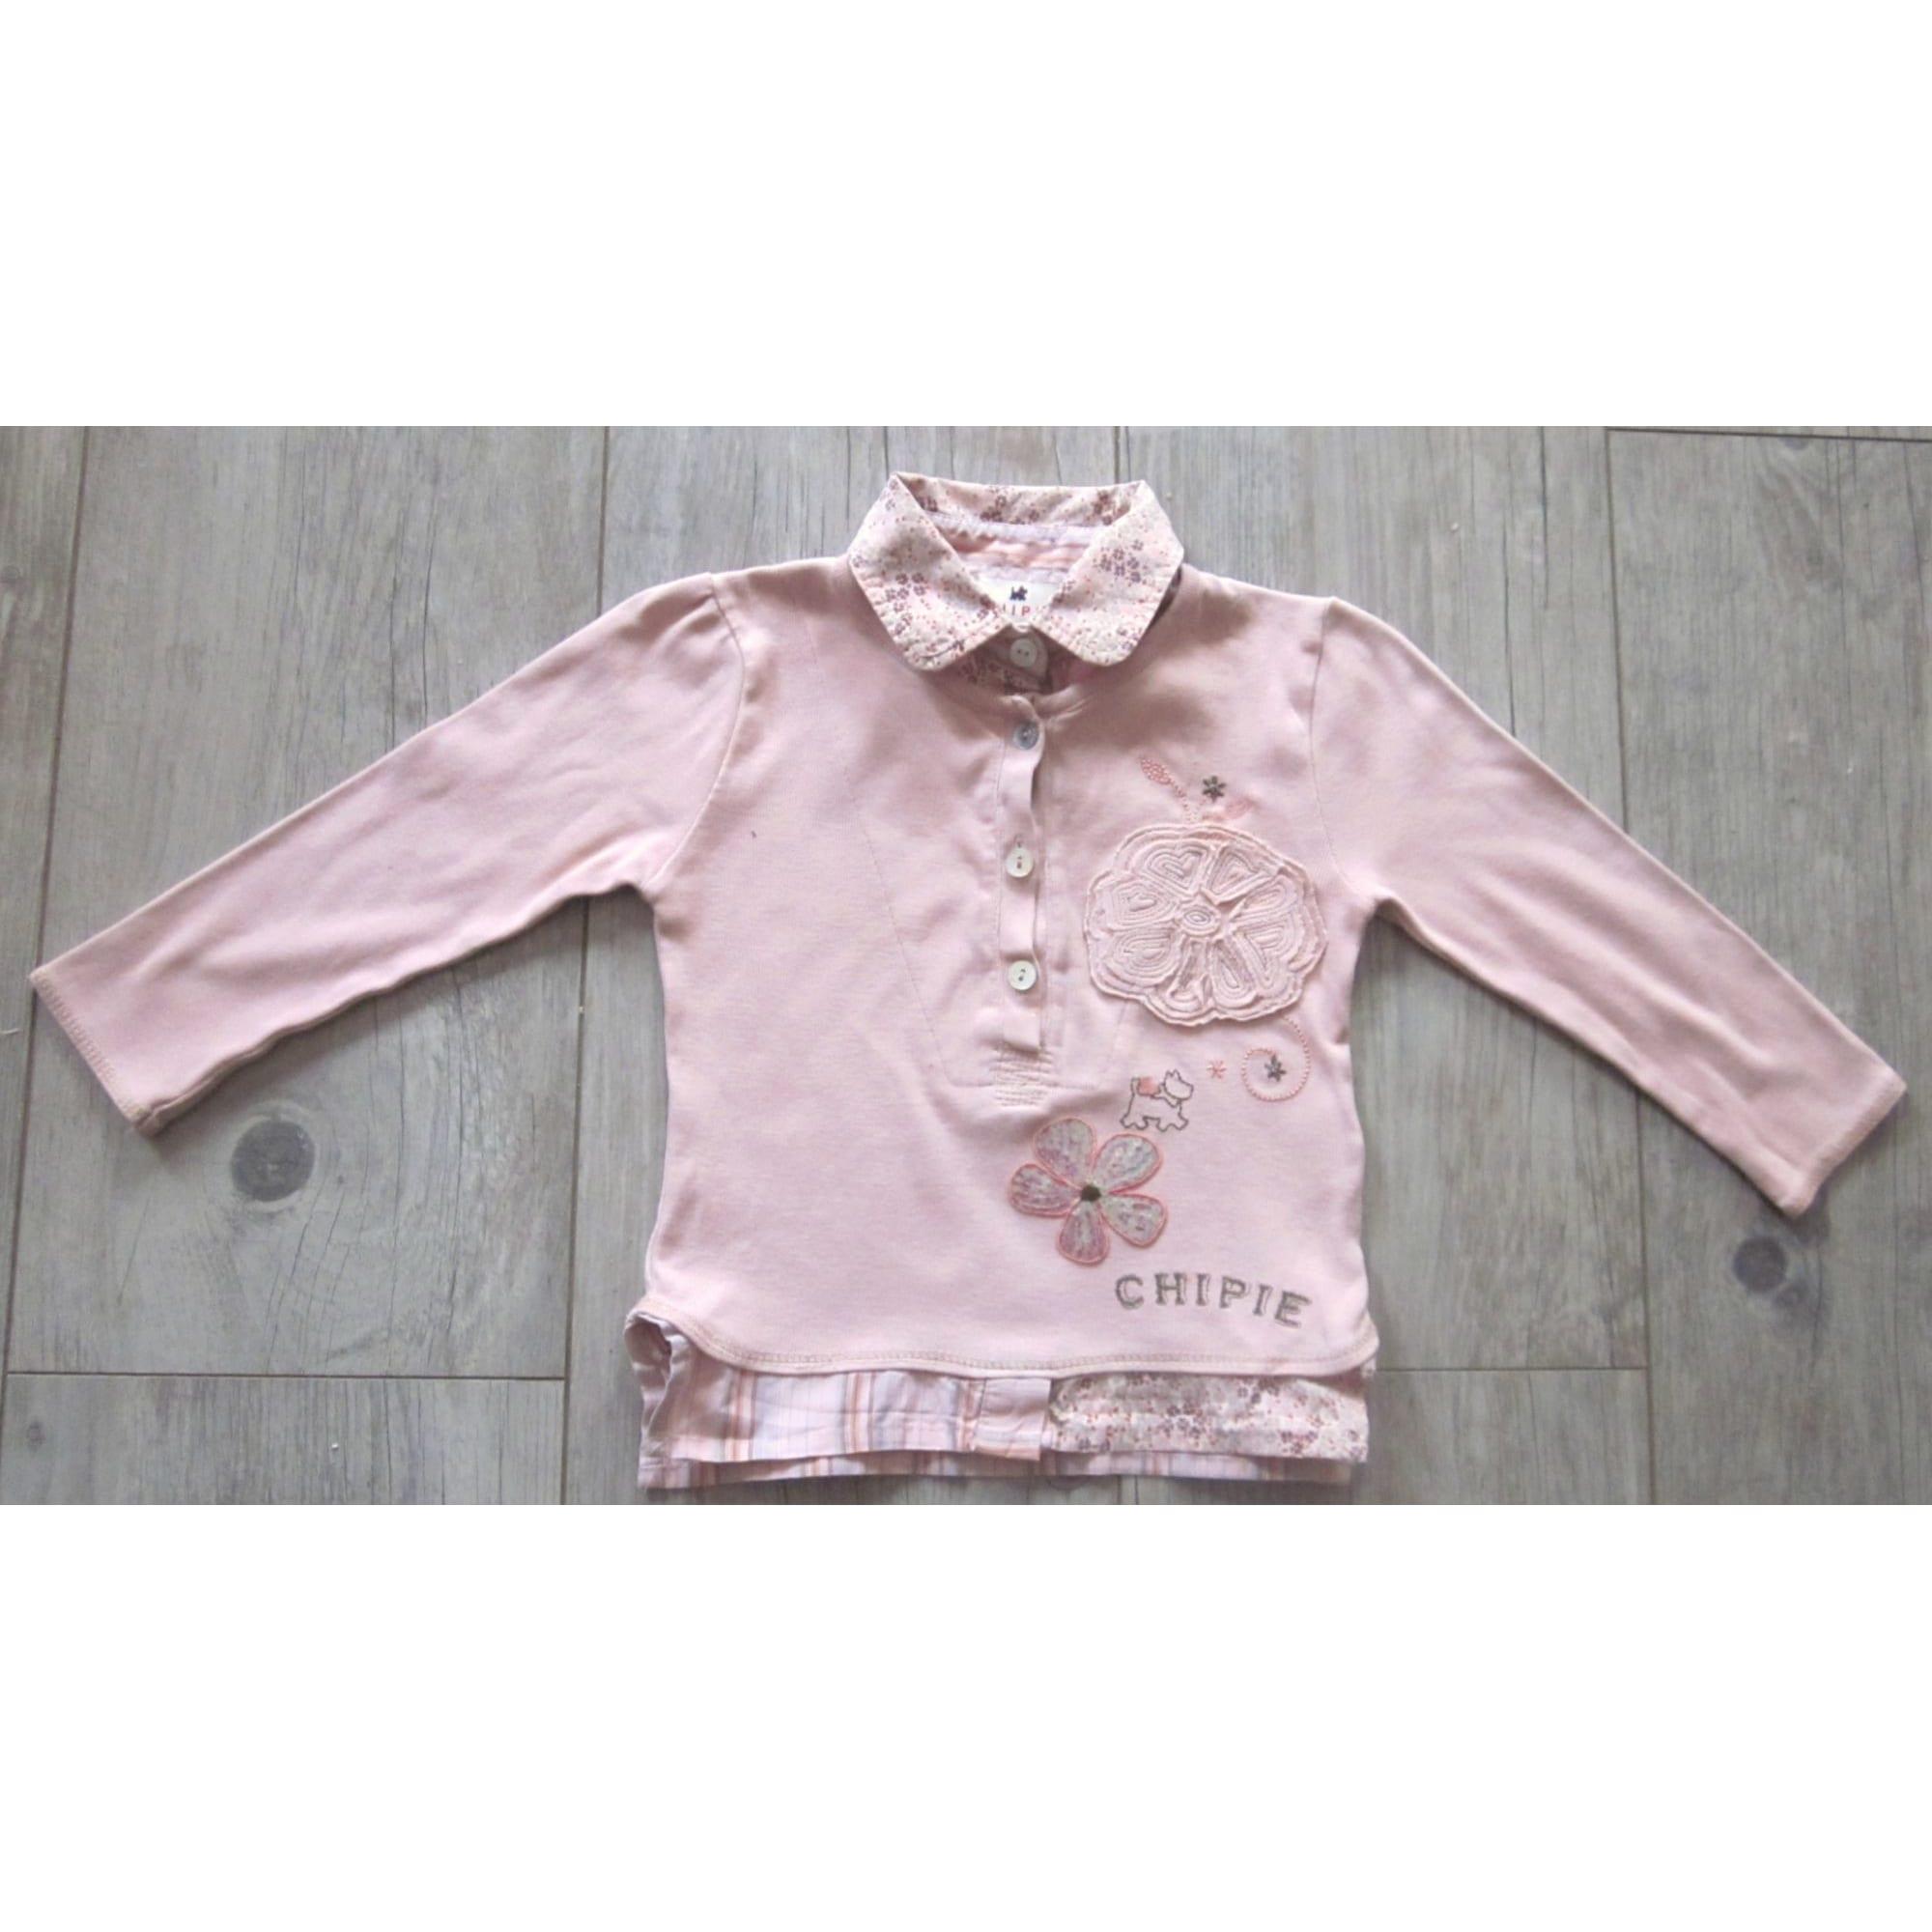 Top, Tee-shirt CHIPIE Rose, fuschia, vieux rose